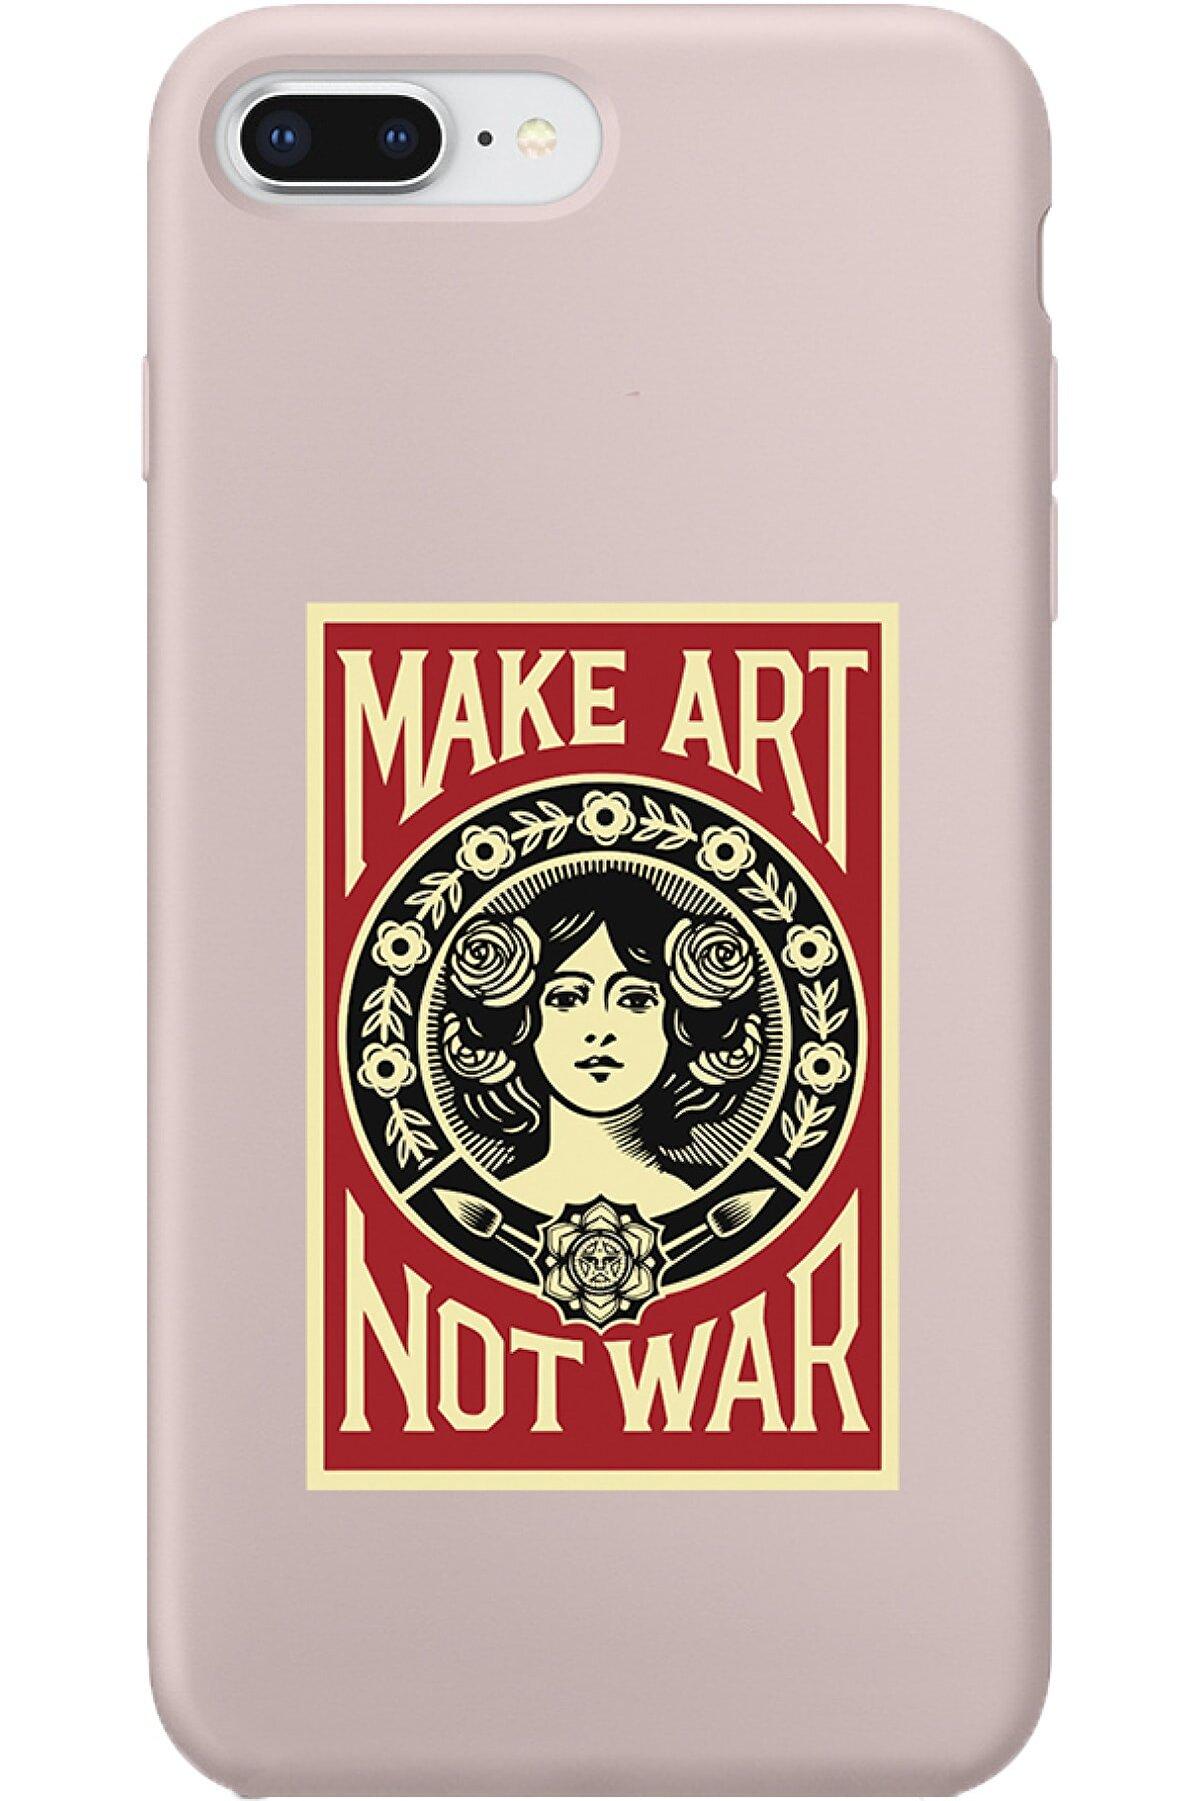 shoptocase Iphone 7 Plus Lansman Make Art Not Wart Desenli Telefon Kılıfı